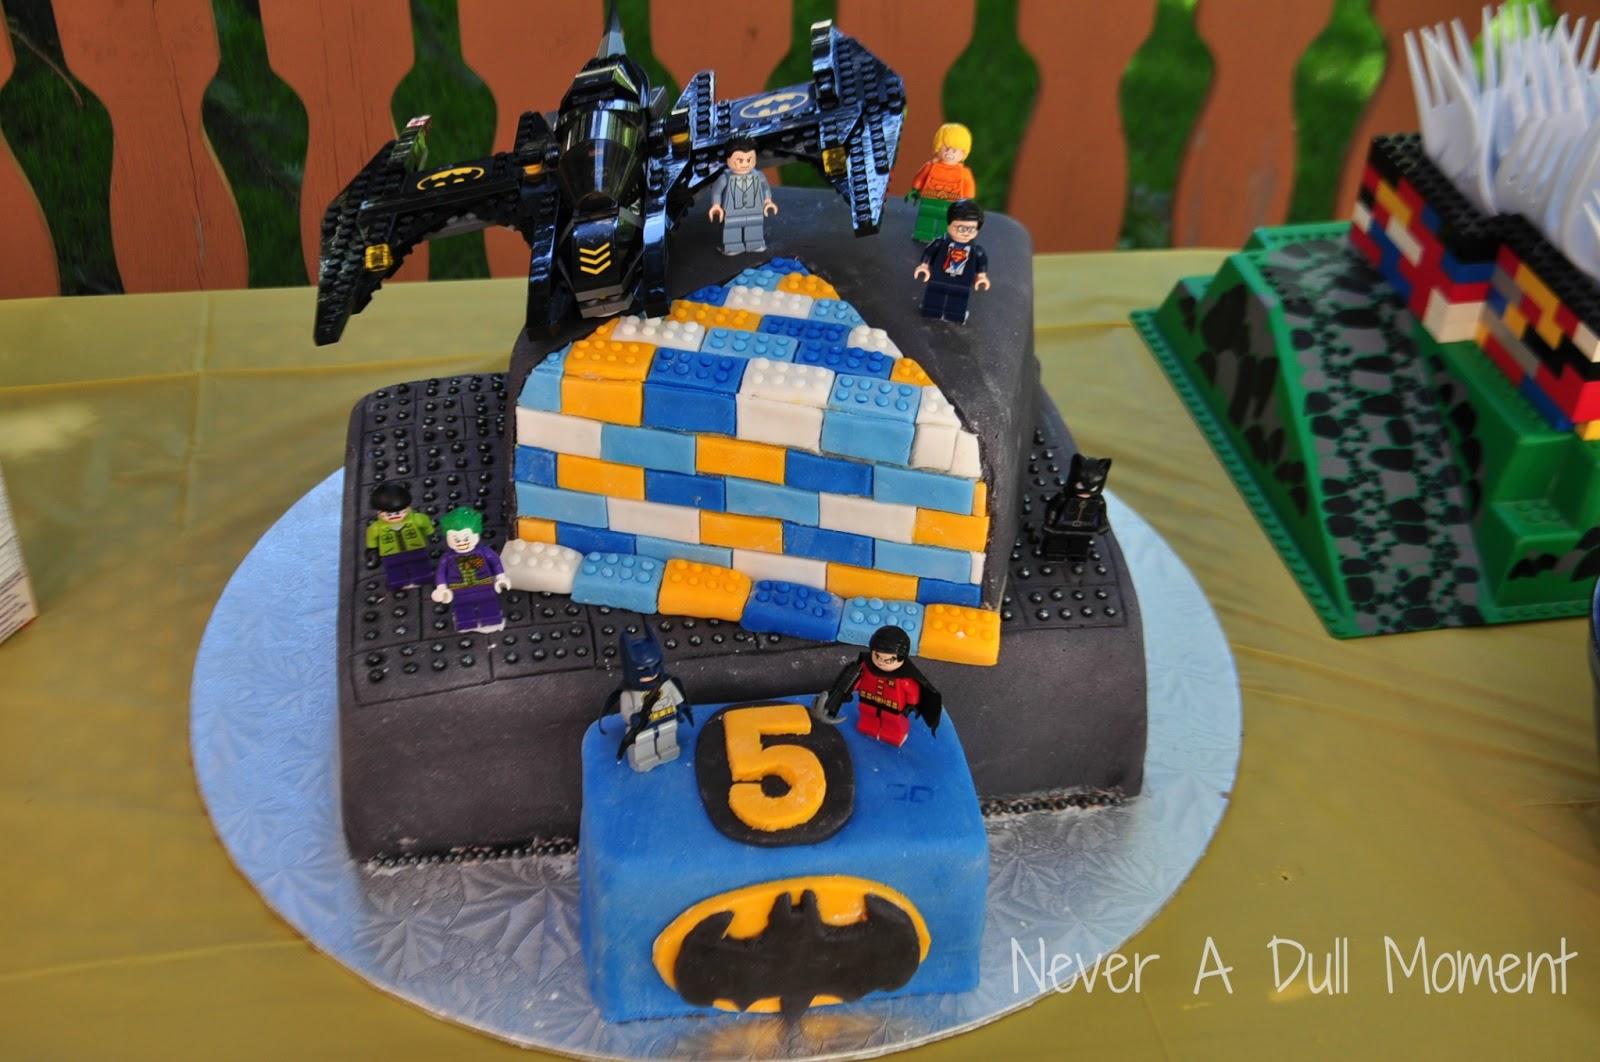 Birthday Cake Ideas Lego ~ Never a dull moment lego batman birthday cake